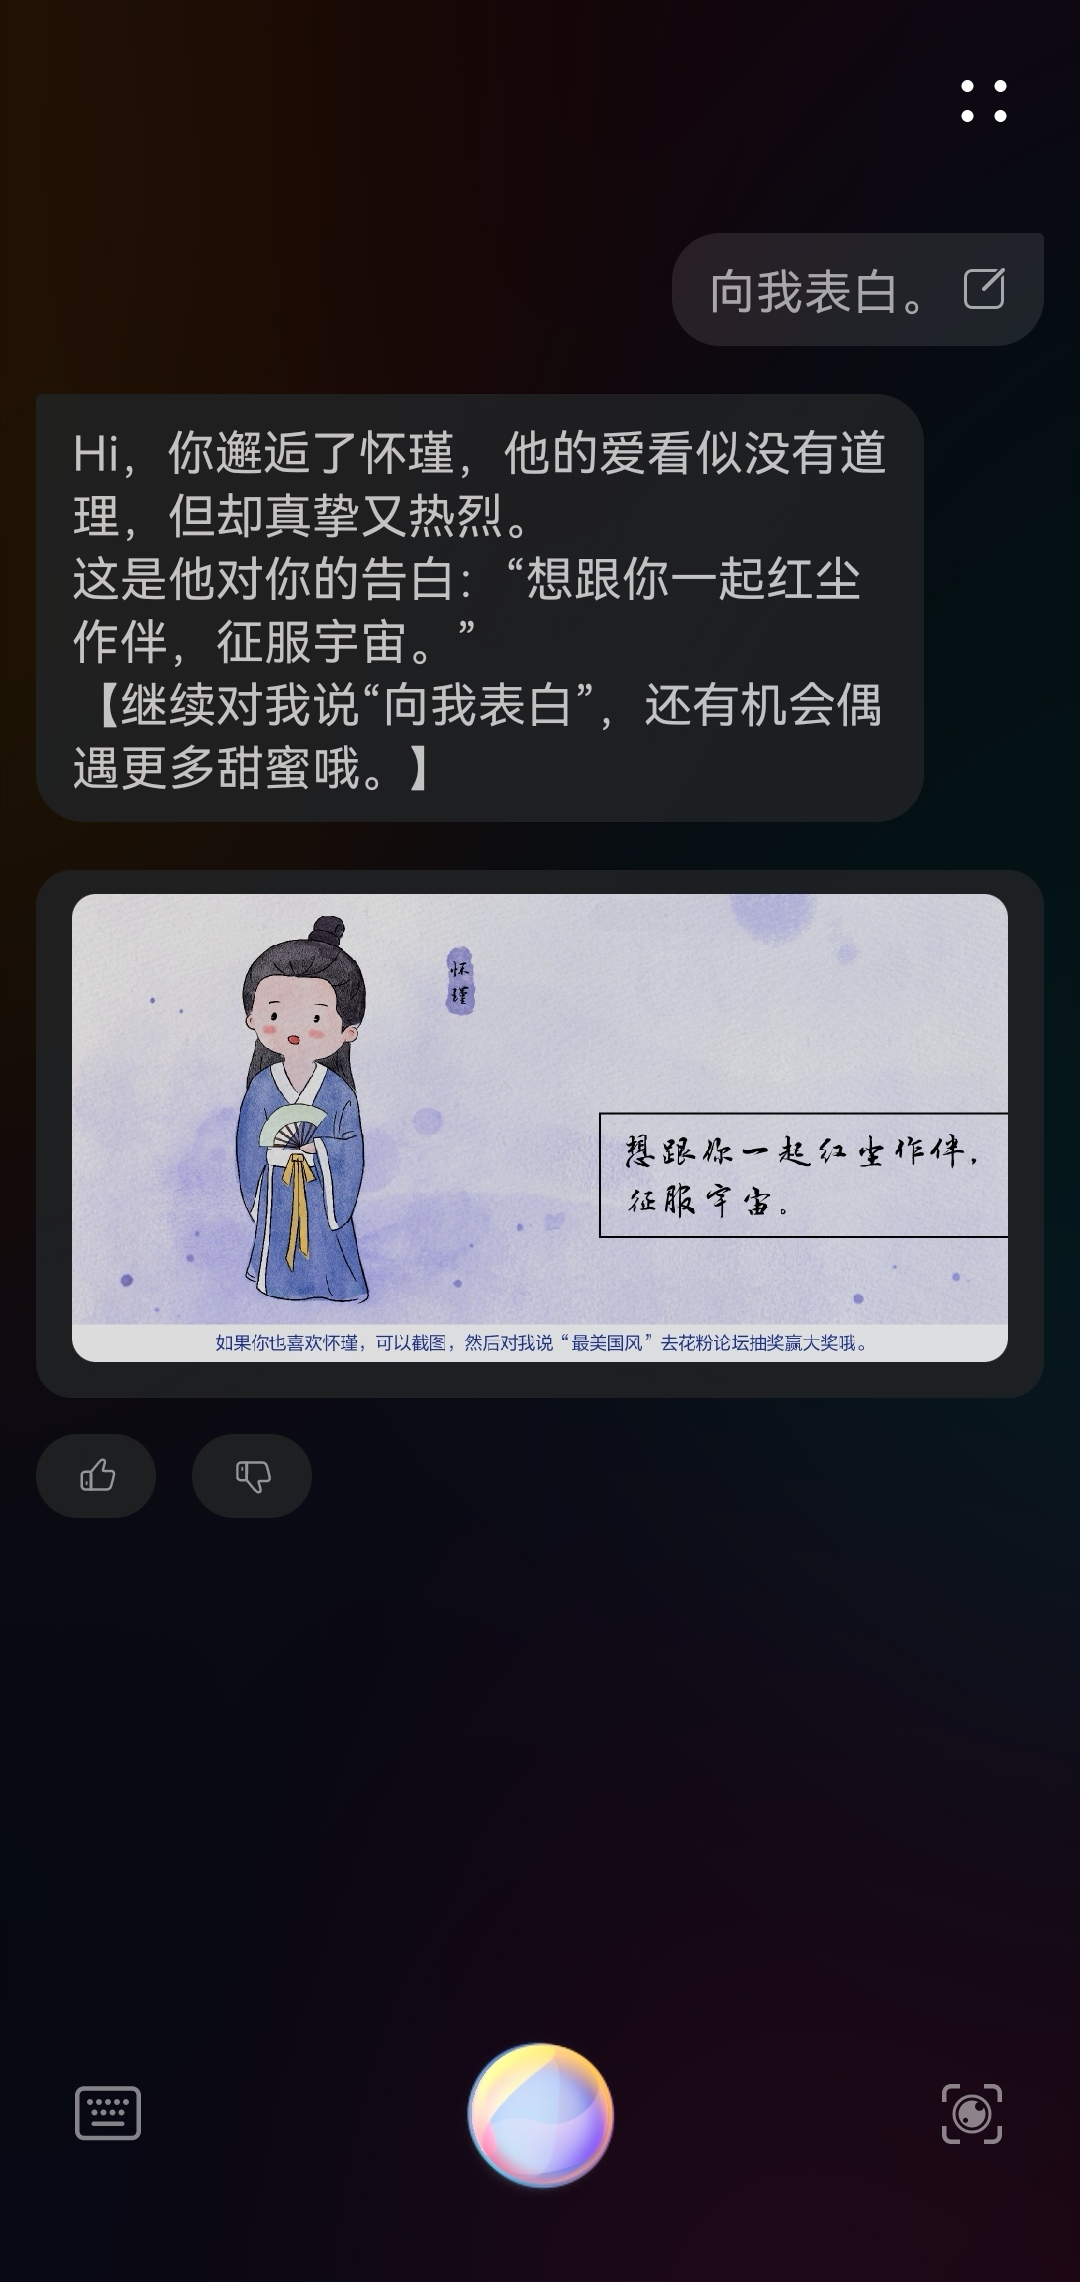 Screenshot_20210611_164037_com.huawei.vassistant_edit_2607760310539.jpg